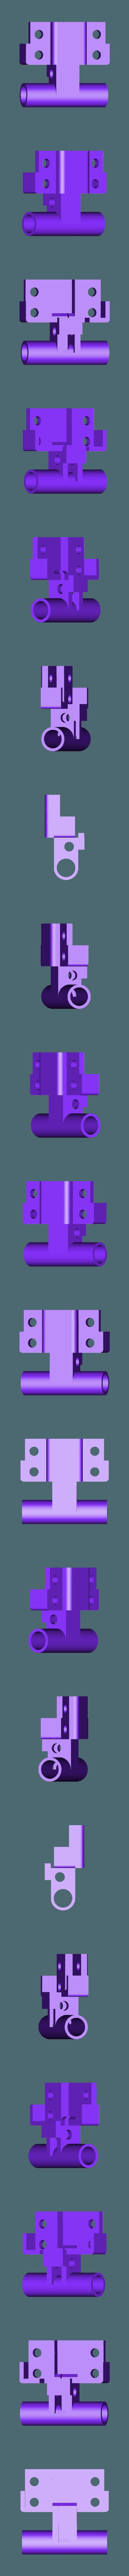 SusoShort.stl Download free STL file Small Humanoid Robot • 3D printable design, choimoni